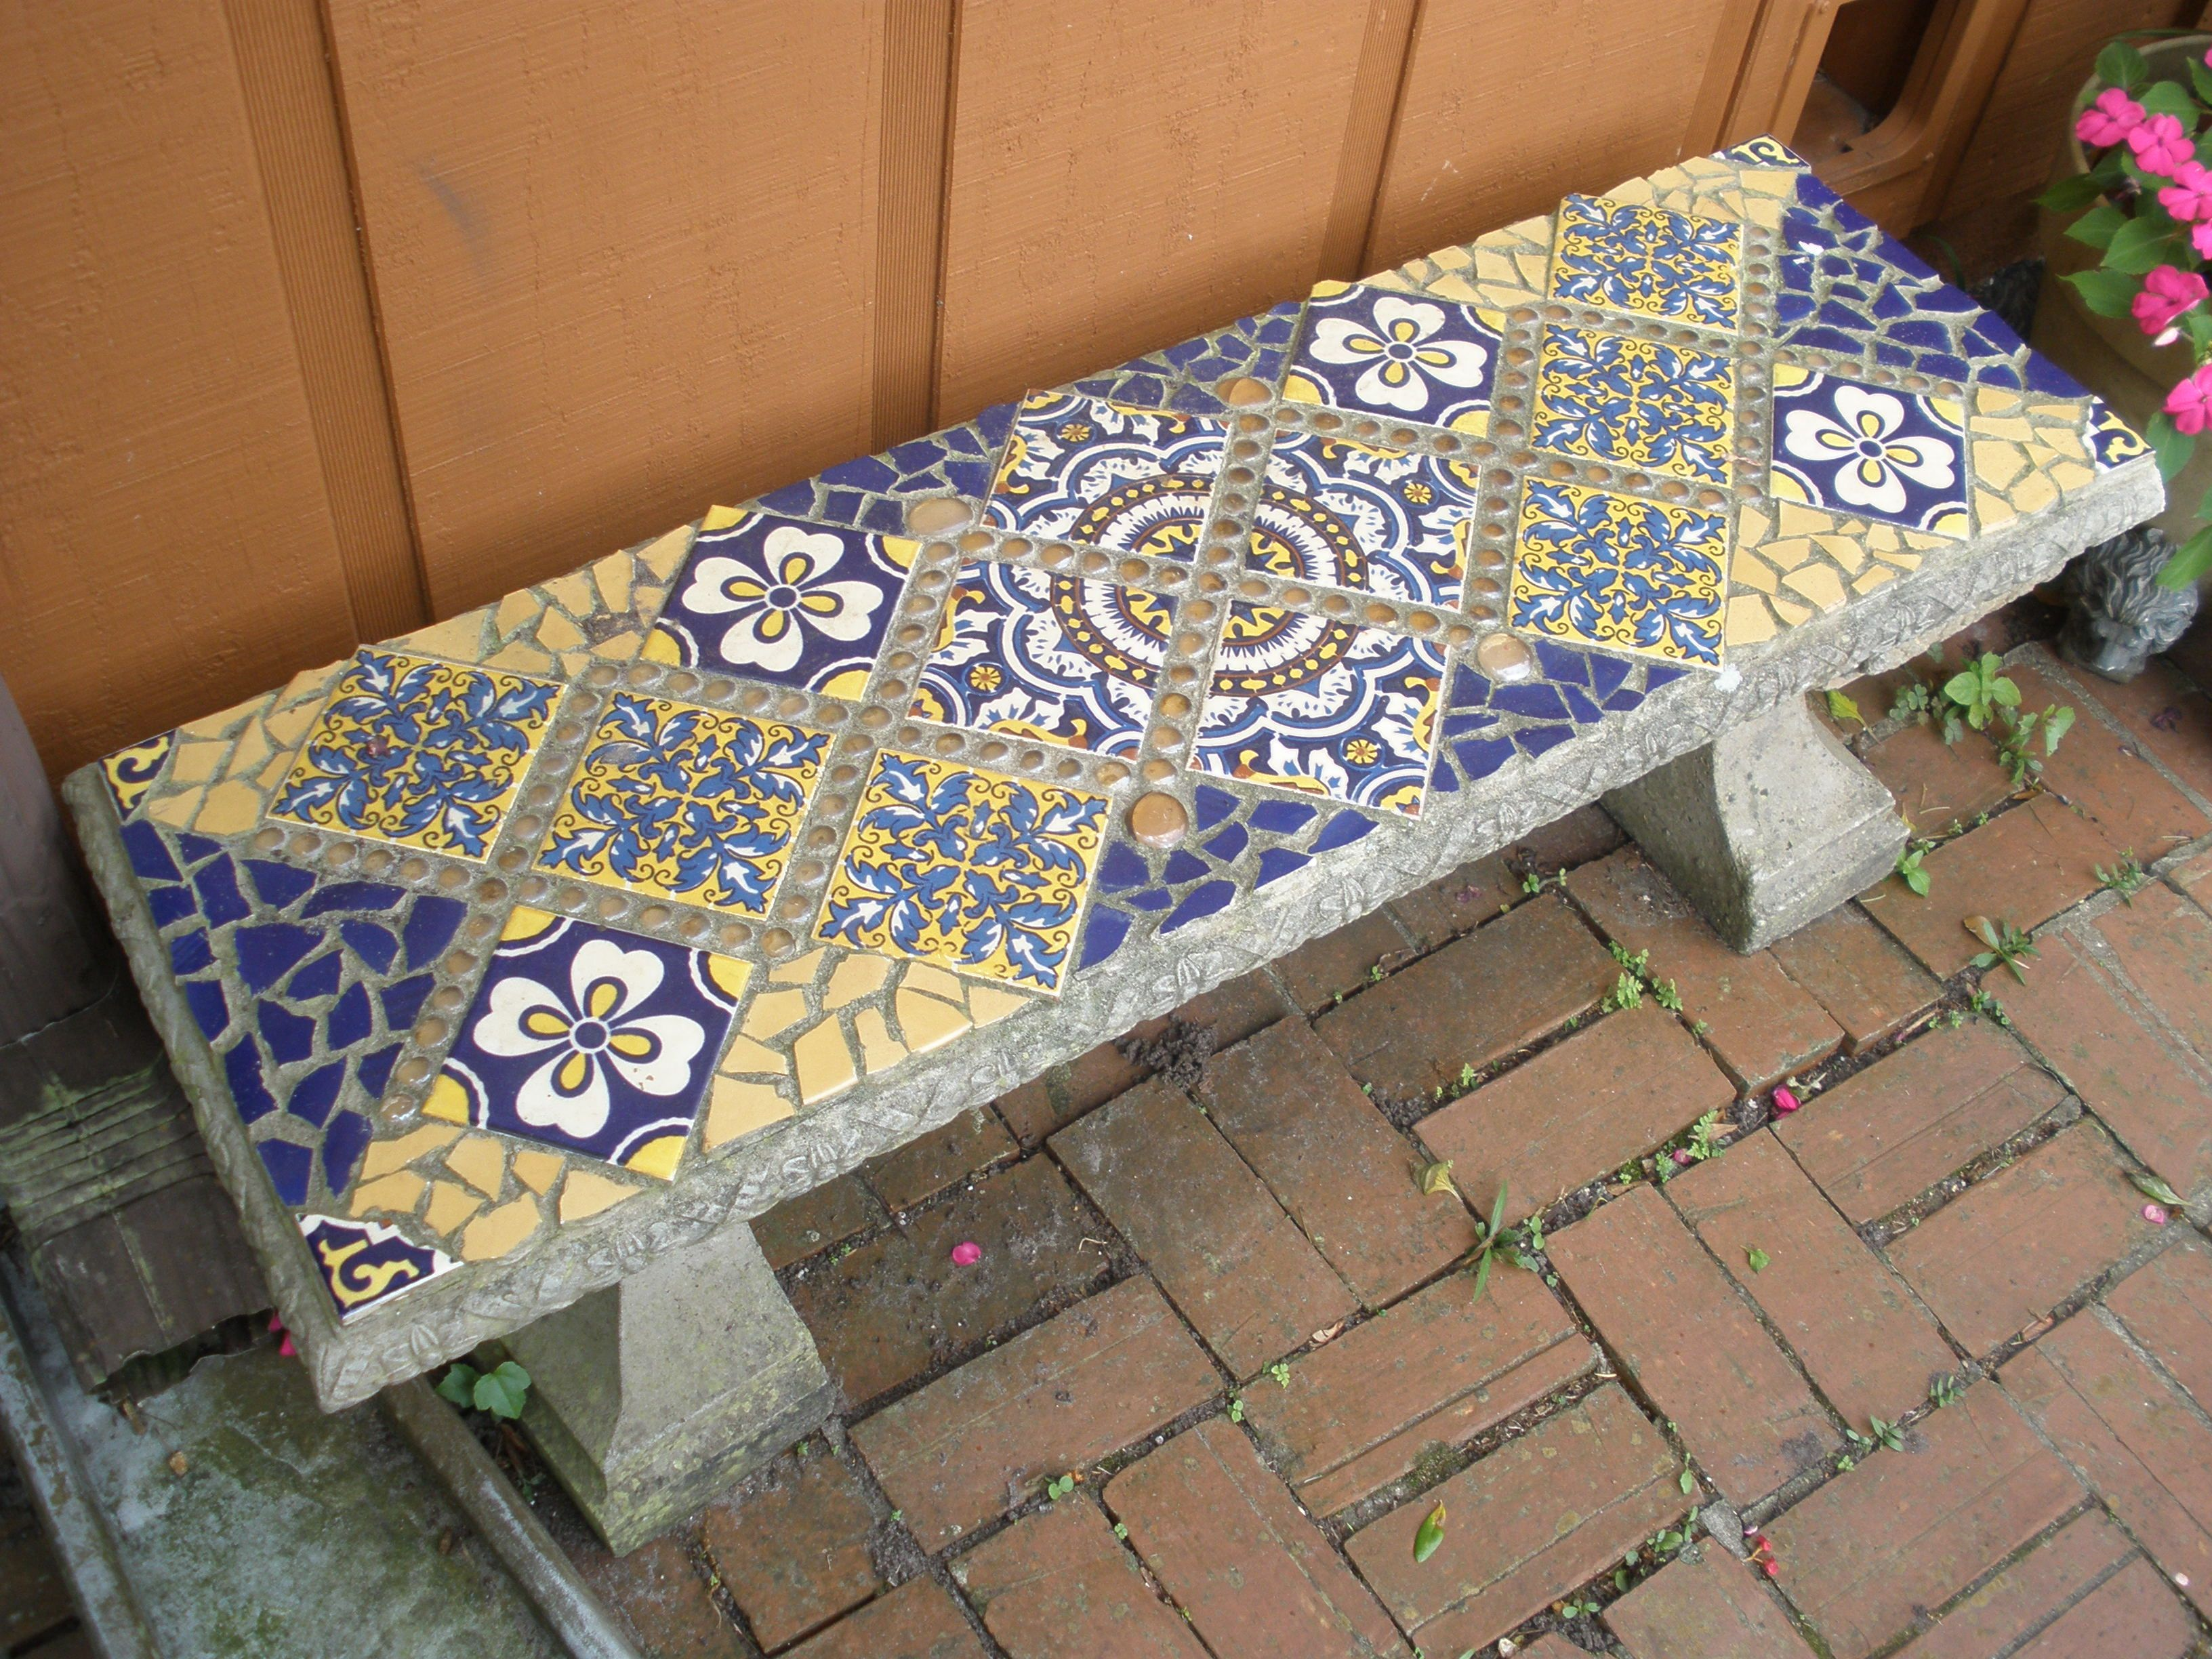 Pin By Rena Designs On Mosaics Mosaic Crafts Mosaic Furniture Mosaic Diy